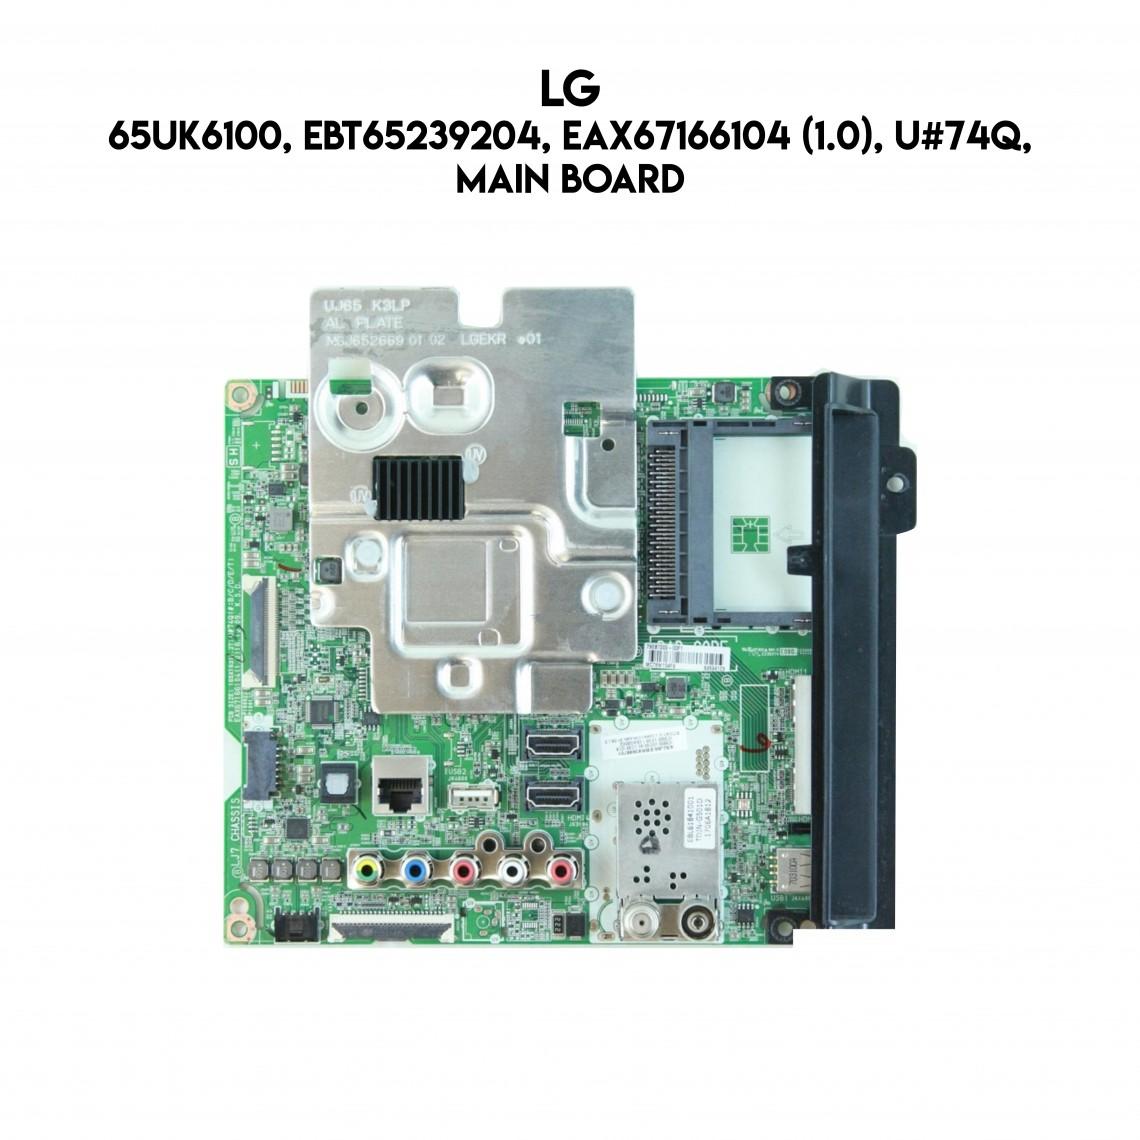 LG, 65UK6100, EBT65239204, EAX67166104 (1.0), U#74Q, Main Board